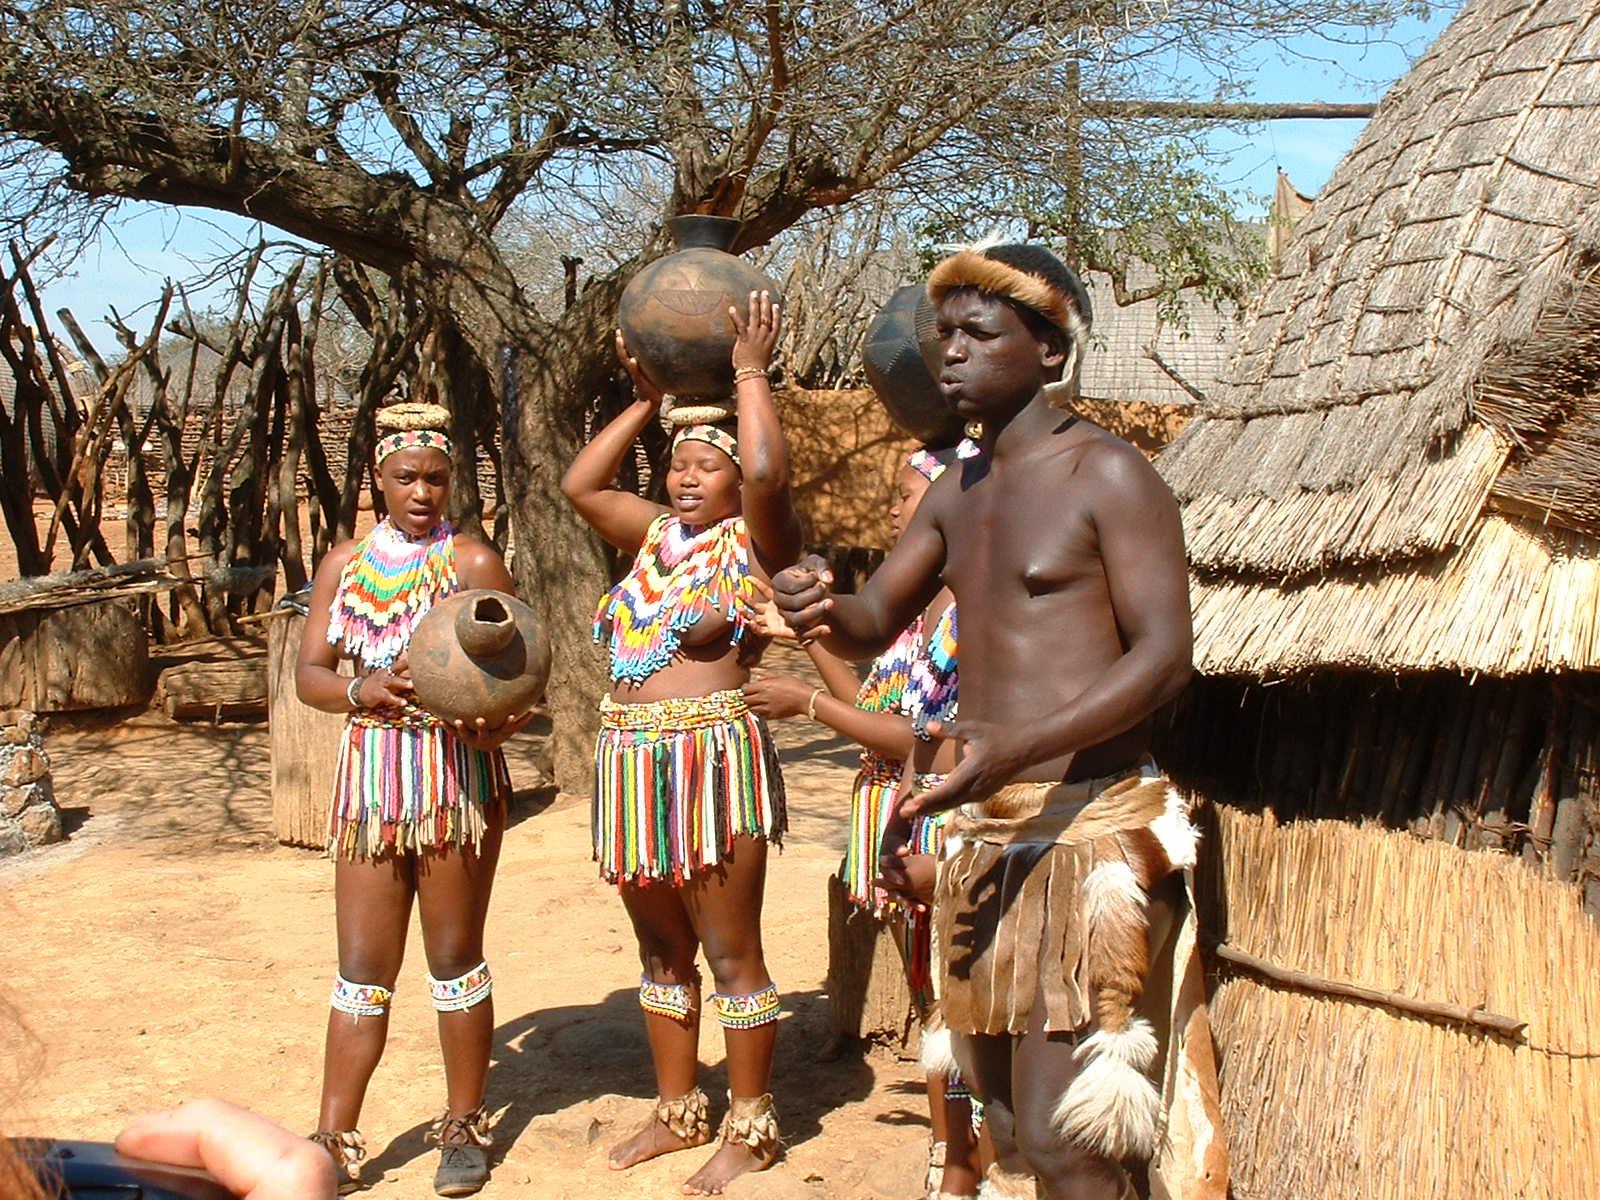 Free vila zulu stock photo freeimages free vila zulu stock photo stopboris Gallery